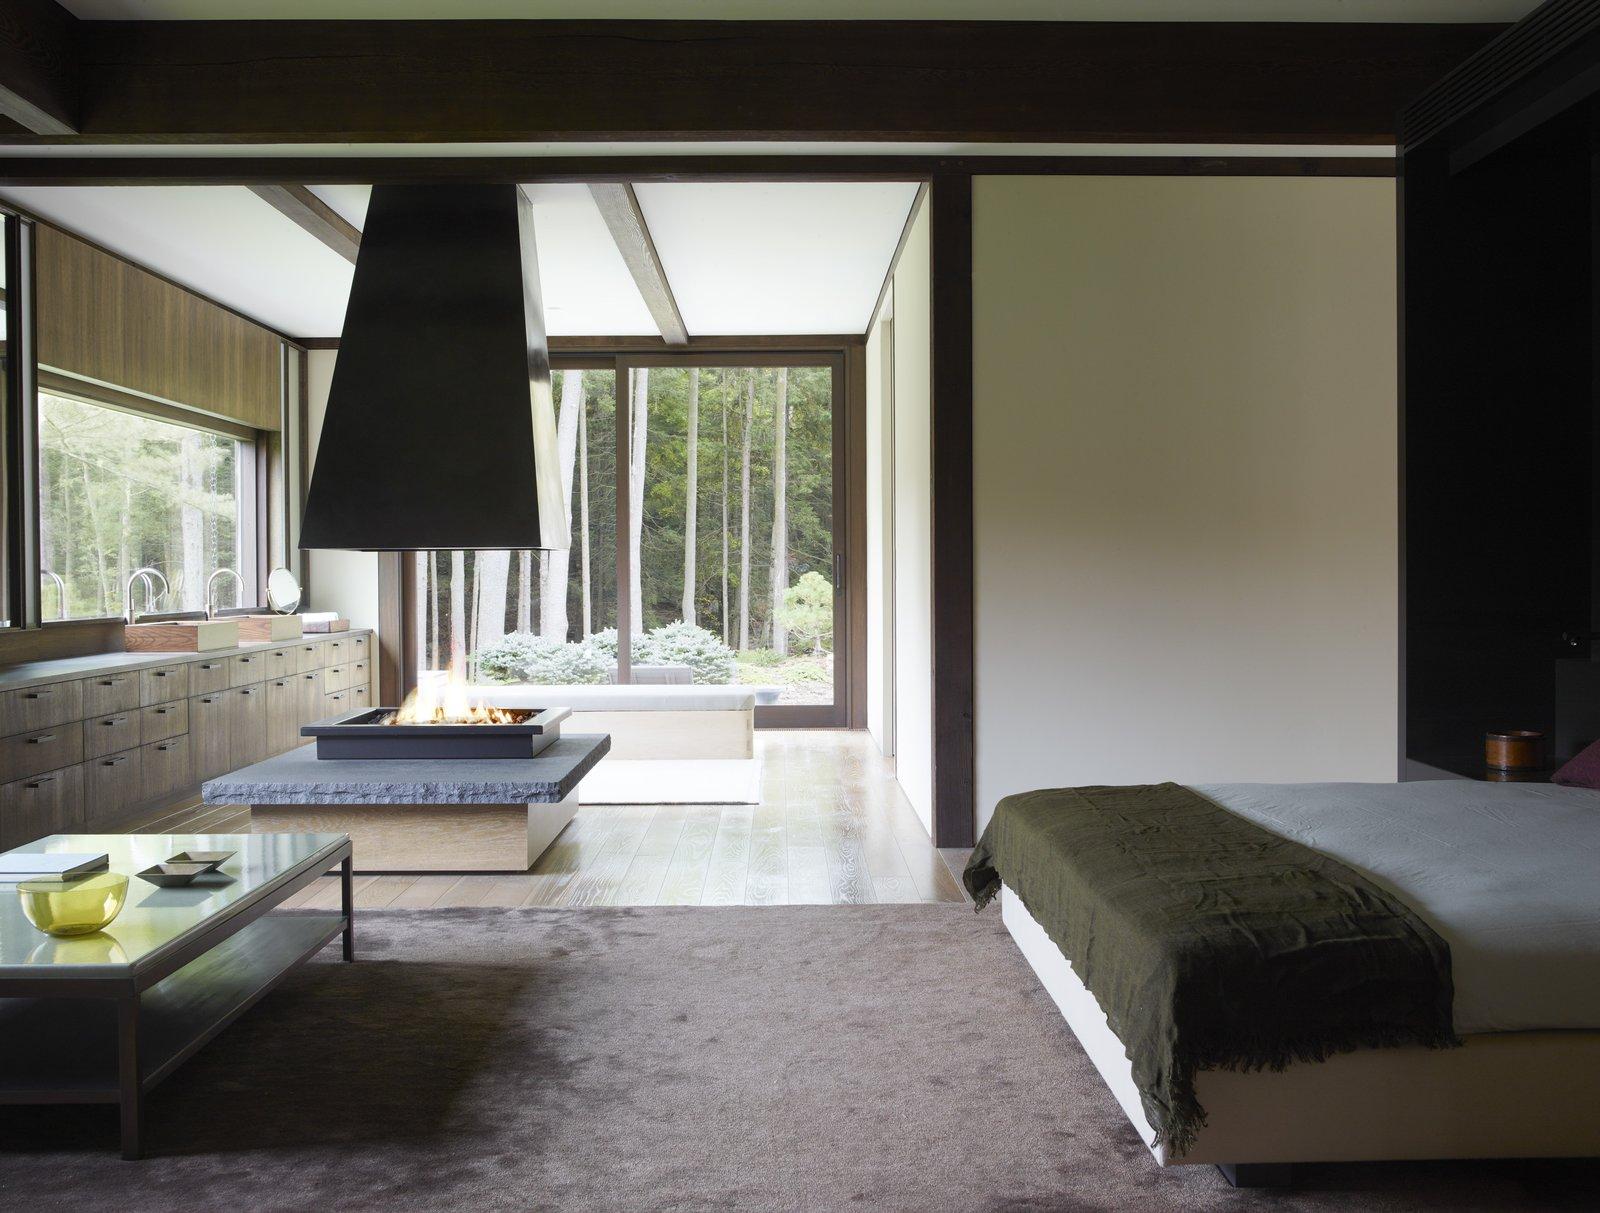 Bedroom, Bed, Medium Hardwood Floor, and Rug Floor  Photo 11 of 15 in Feast Your Eyes on Fashion Designer Josie Natori's Japanese-Inspired Home